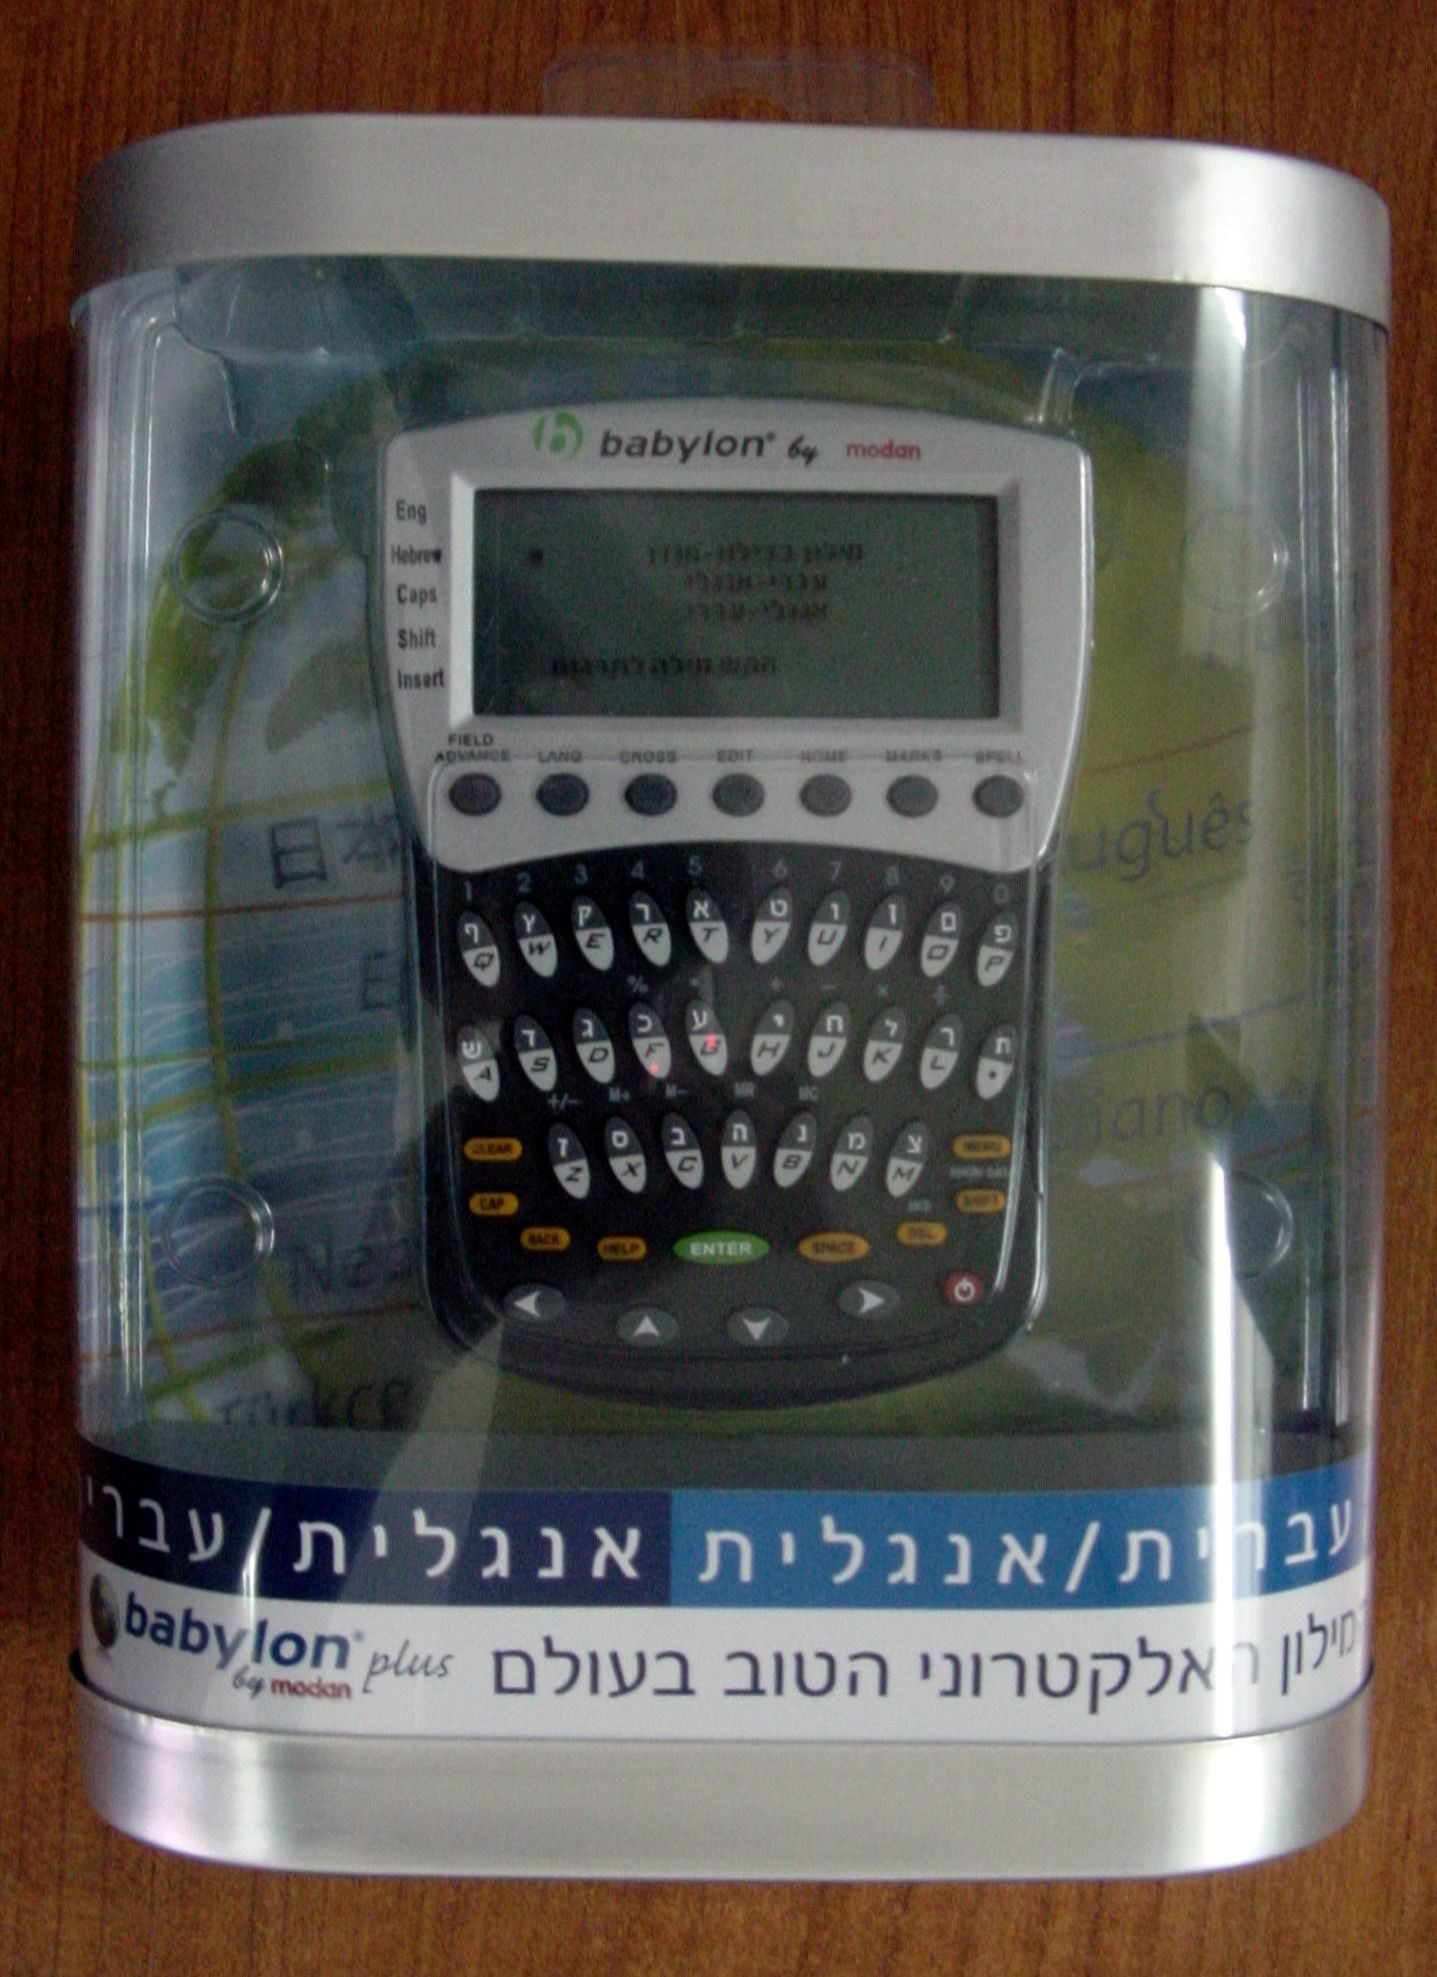 Babylon Handheld Hebrew English Dictionary